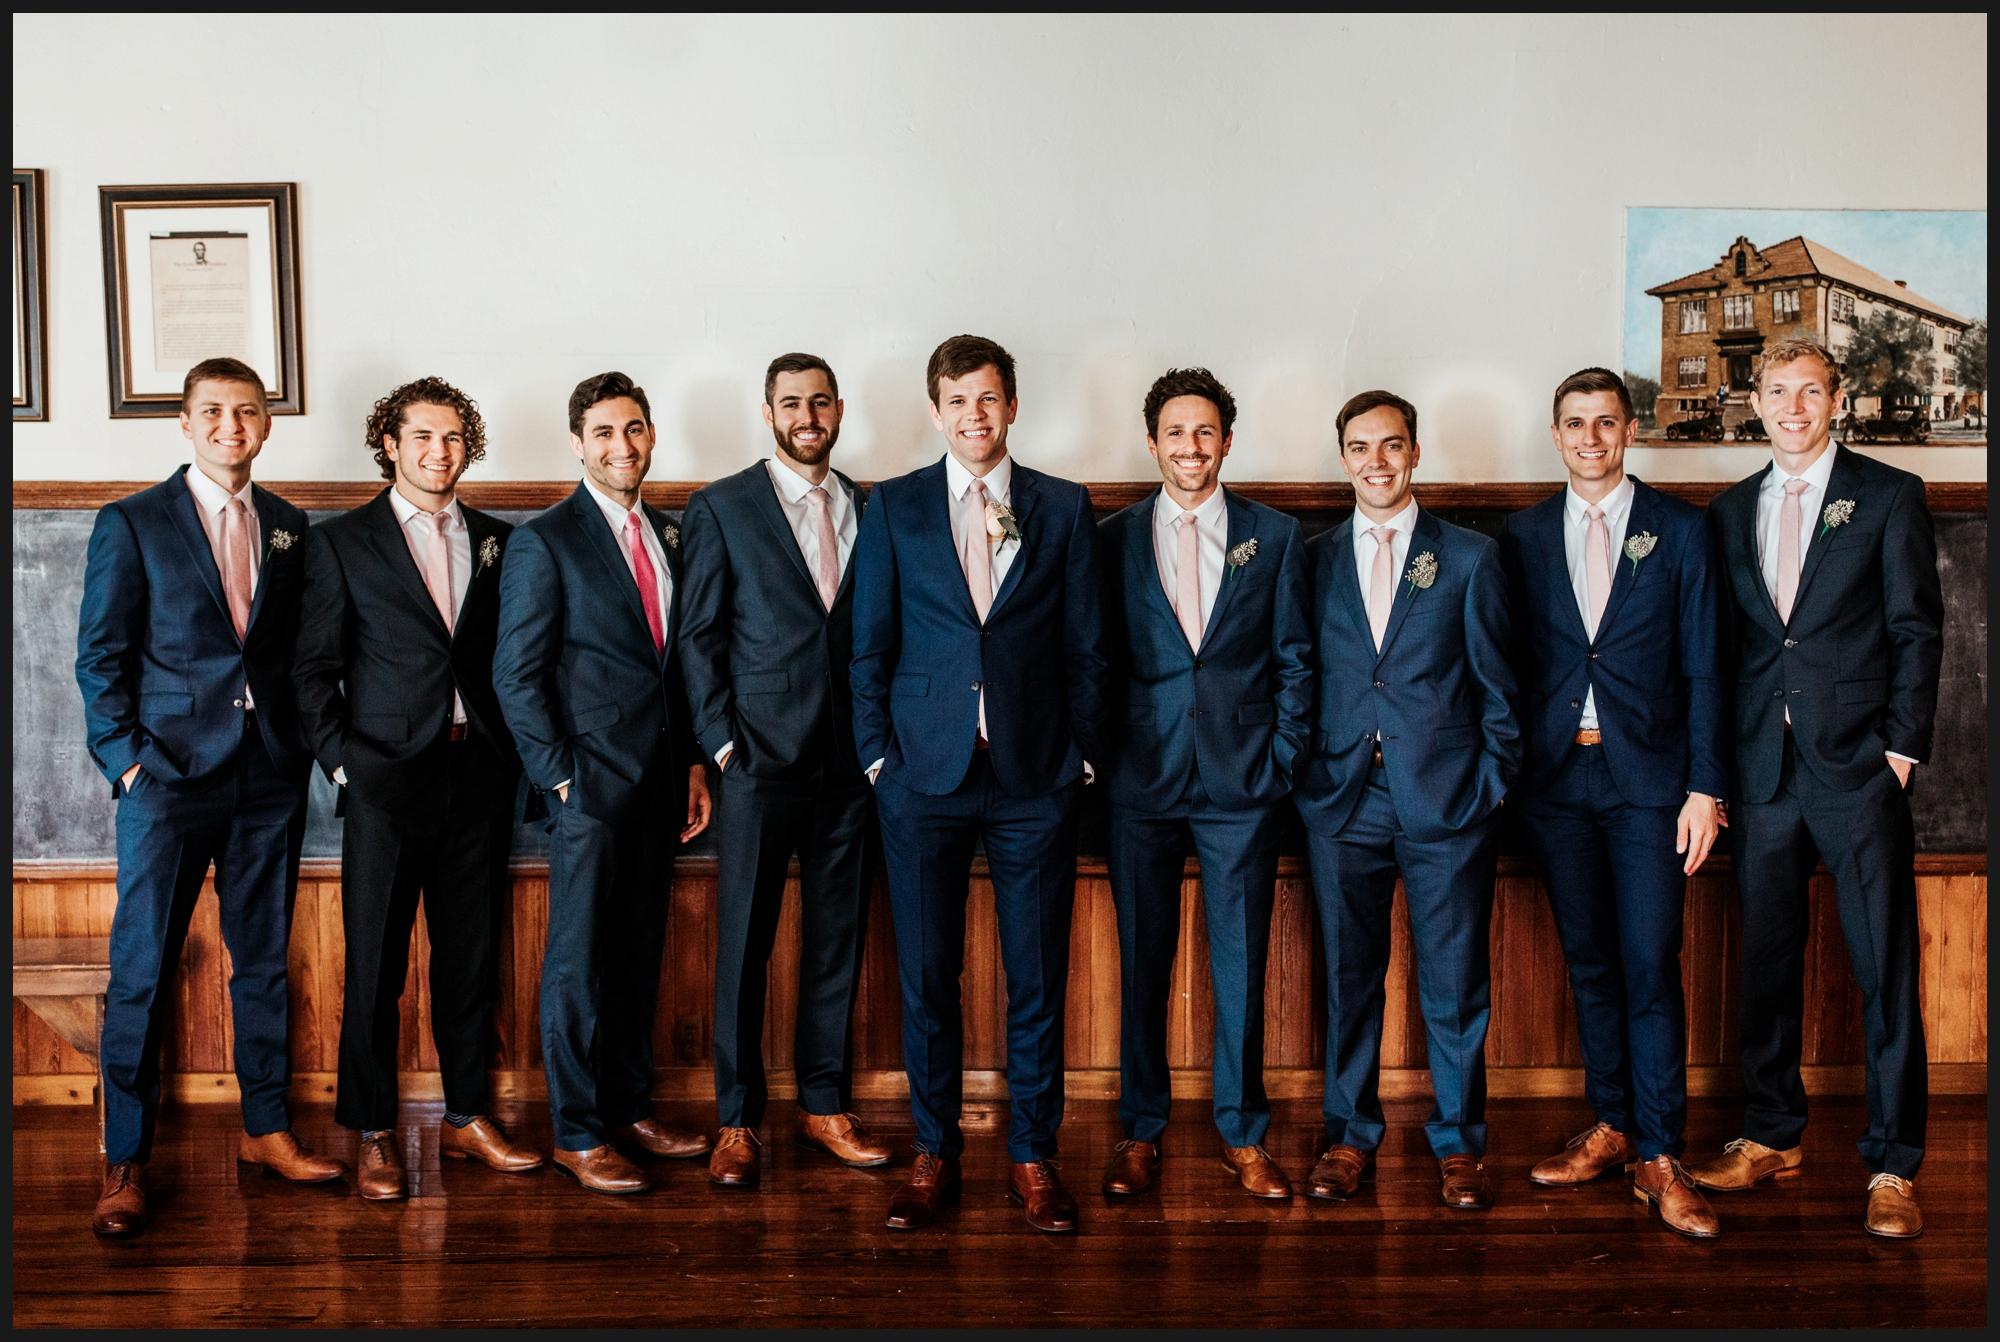 Orlando-Wedding-Photographer-destination-wedding-photographer-florida-wedding-photographer-bohemian-wedding-photographer_1734.jpg